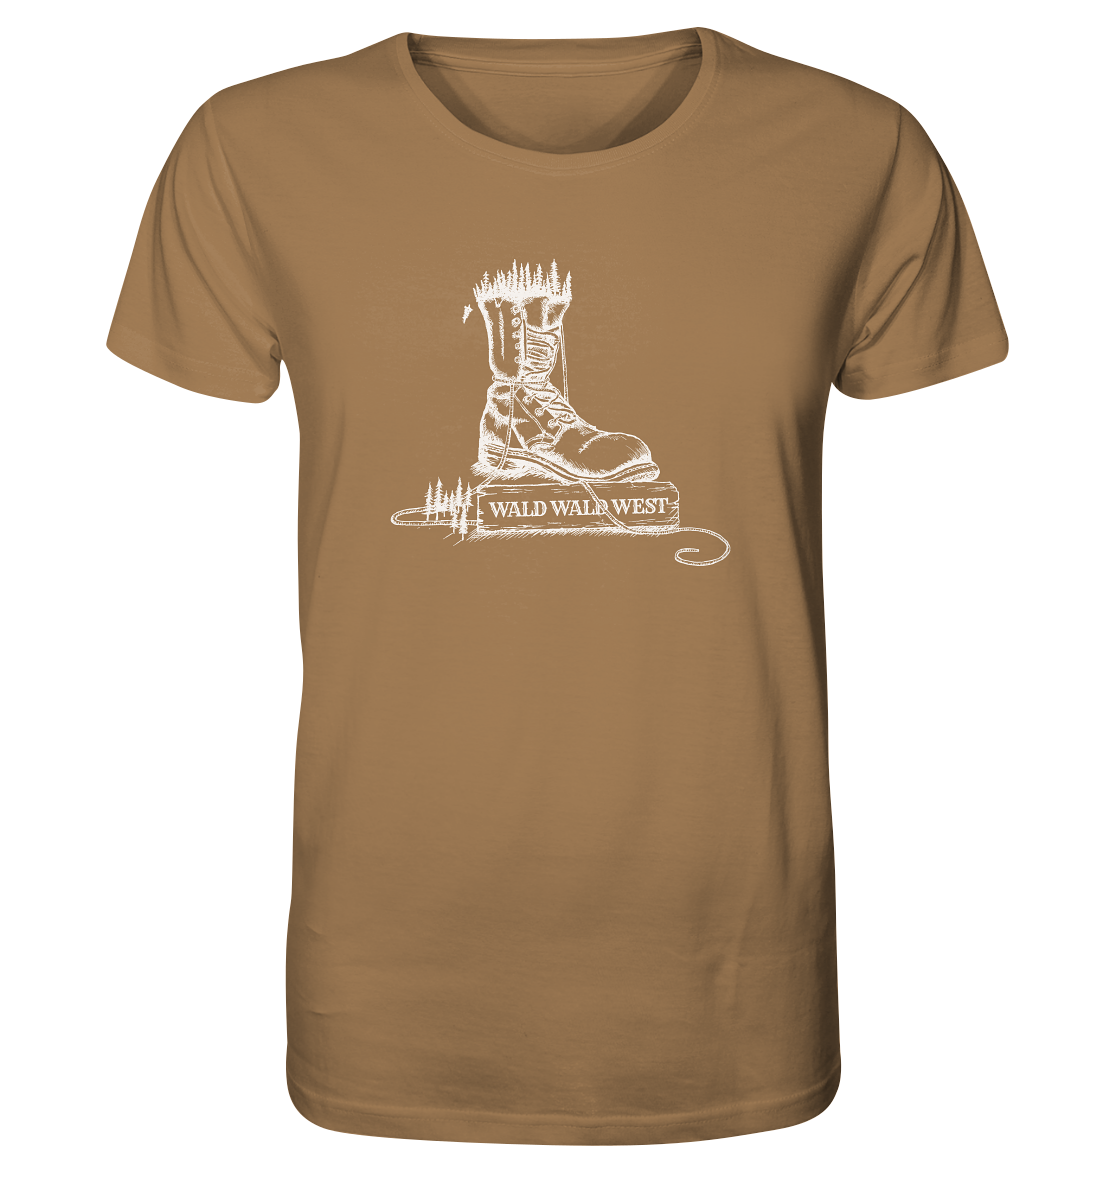 front-organic-shirt-a17c55-1116x.png